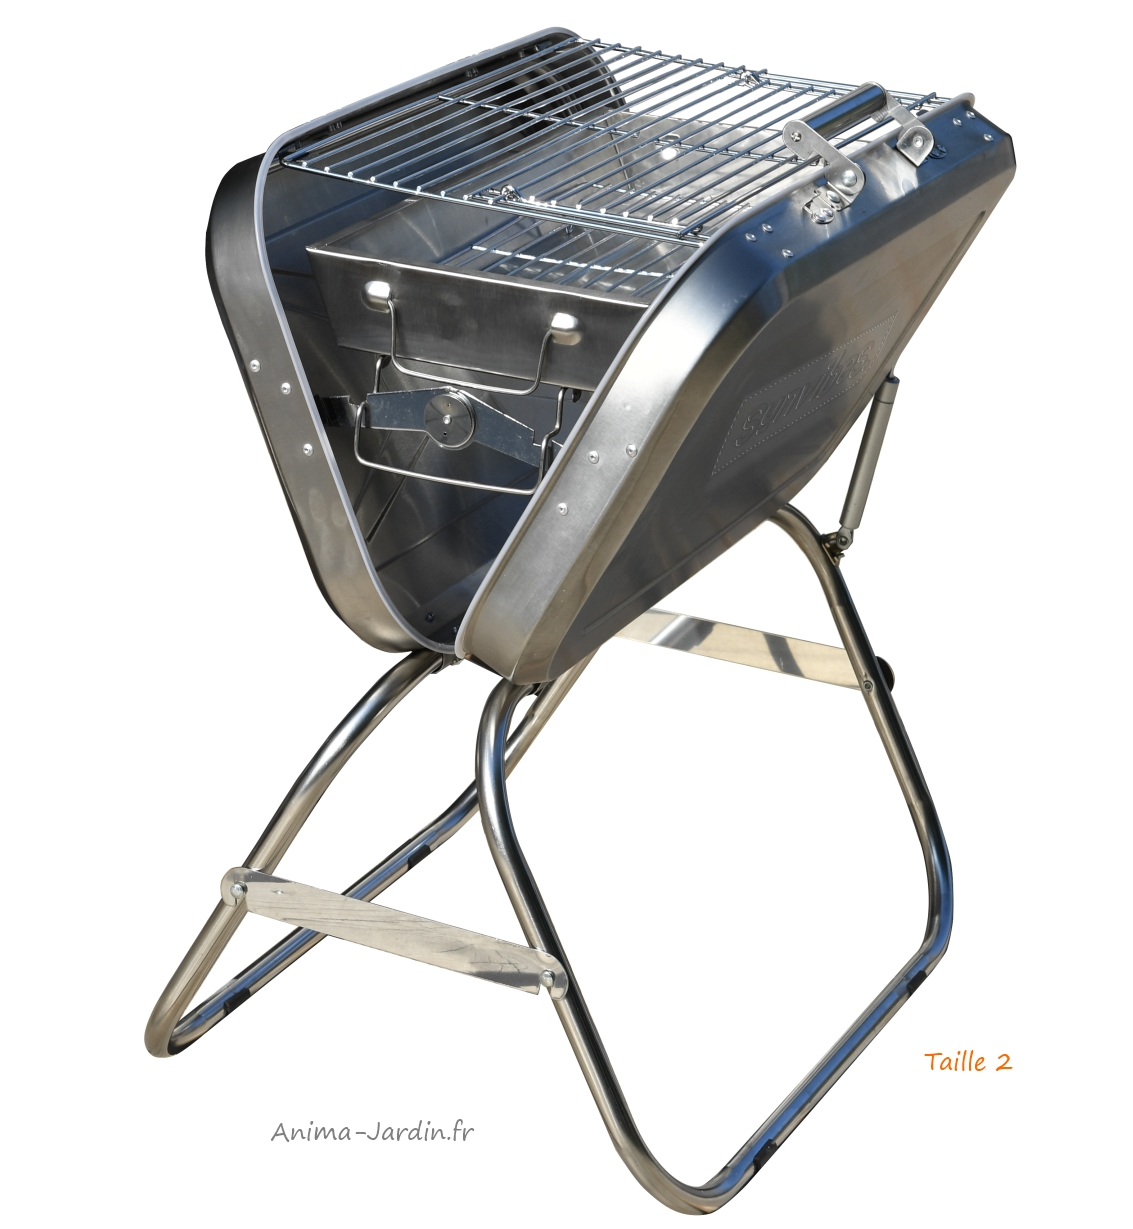 Barbecue-charbon-pliable-inox-T2-anima-jardin.fr